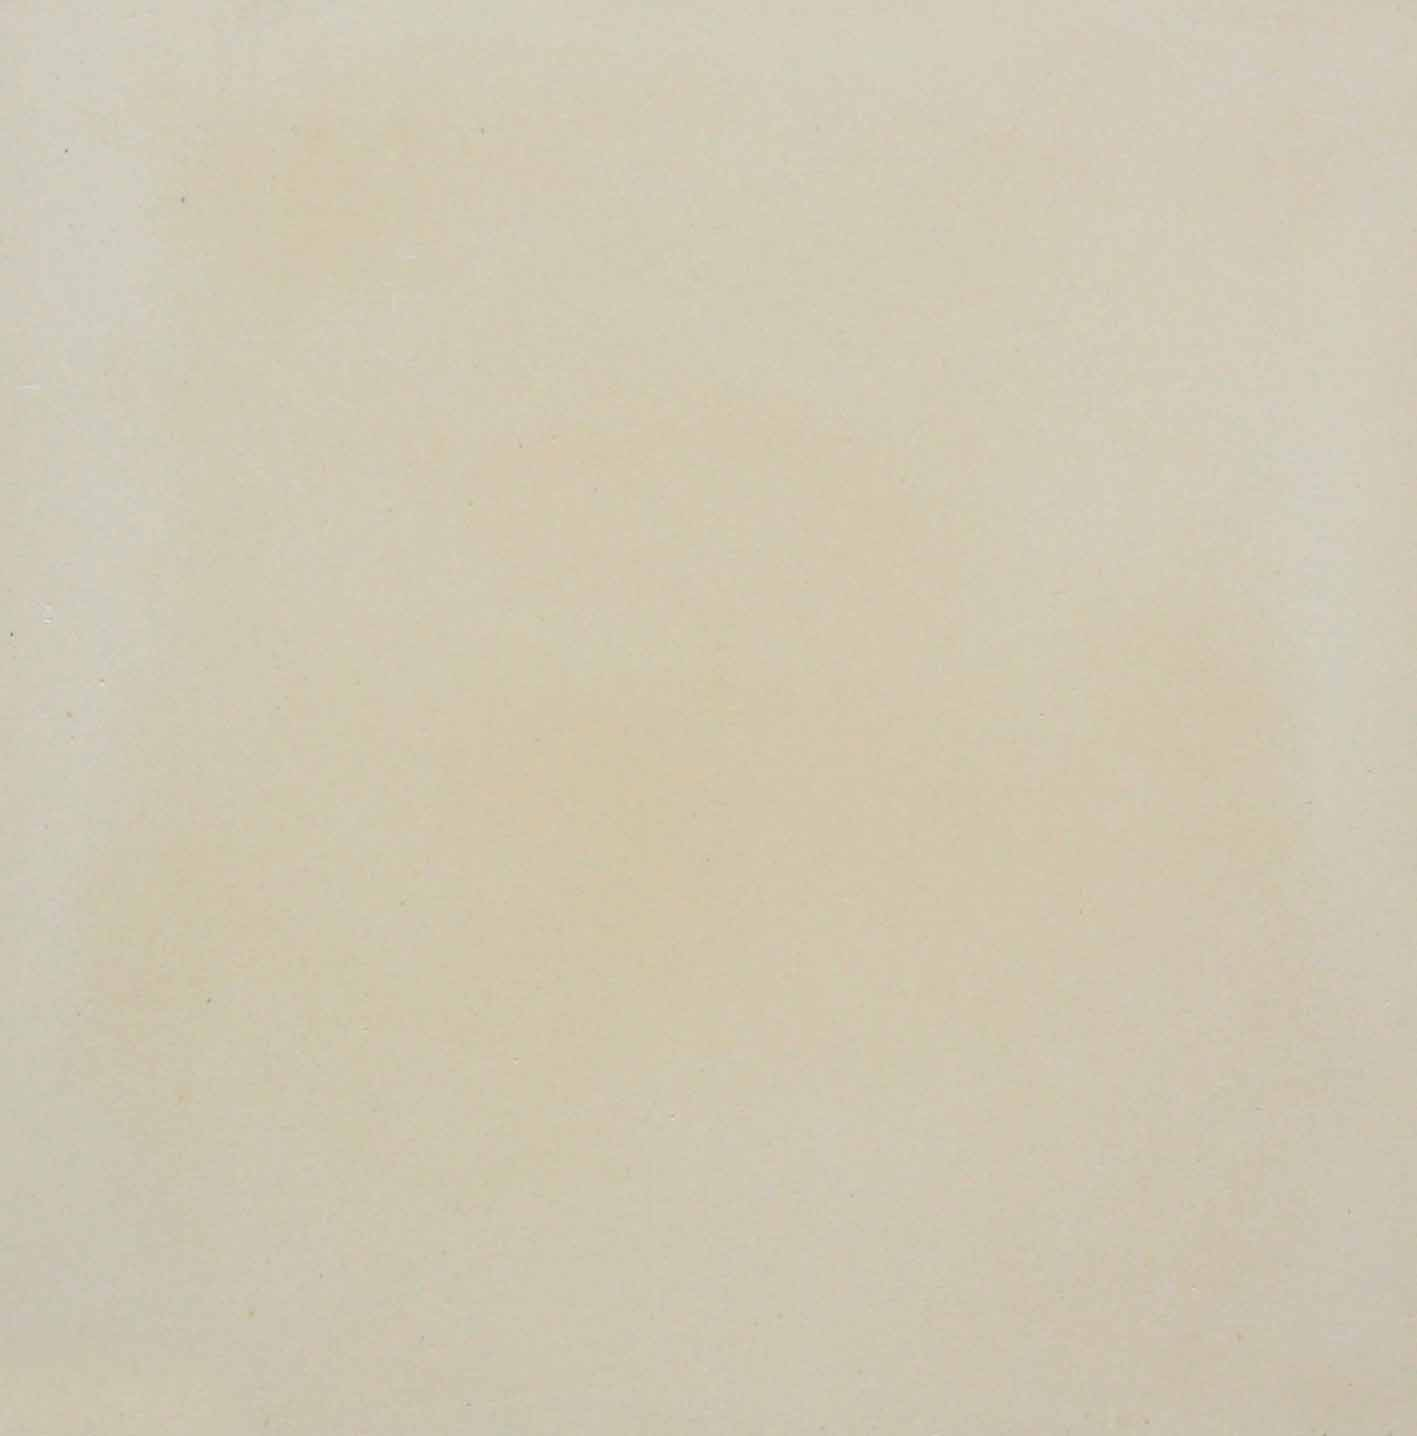 zementfliese serie castillo uni farbe beige 10 von replicata 200 x 200 x 20 mm replikate. Black Bedroom Furniture Sets. Home Design Ideas